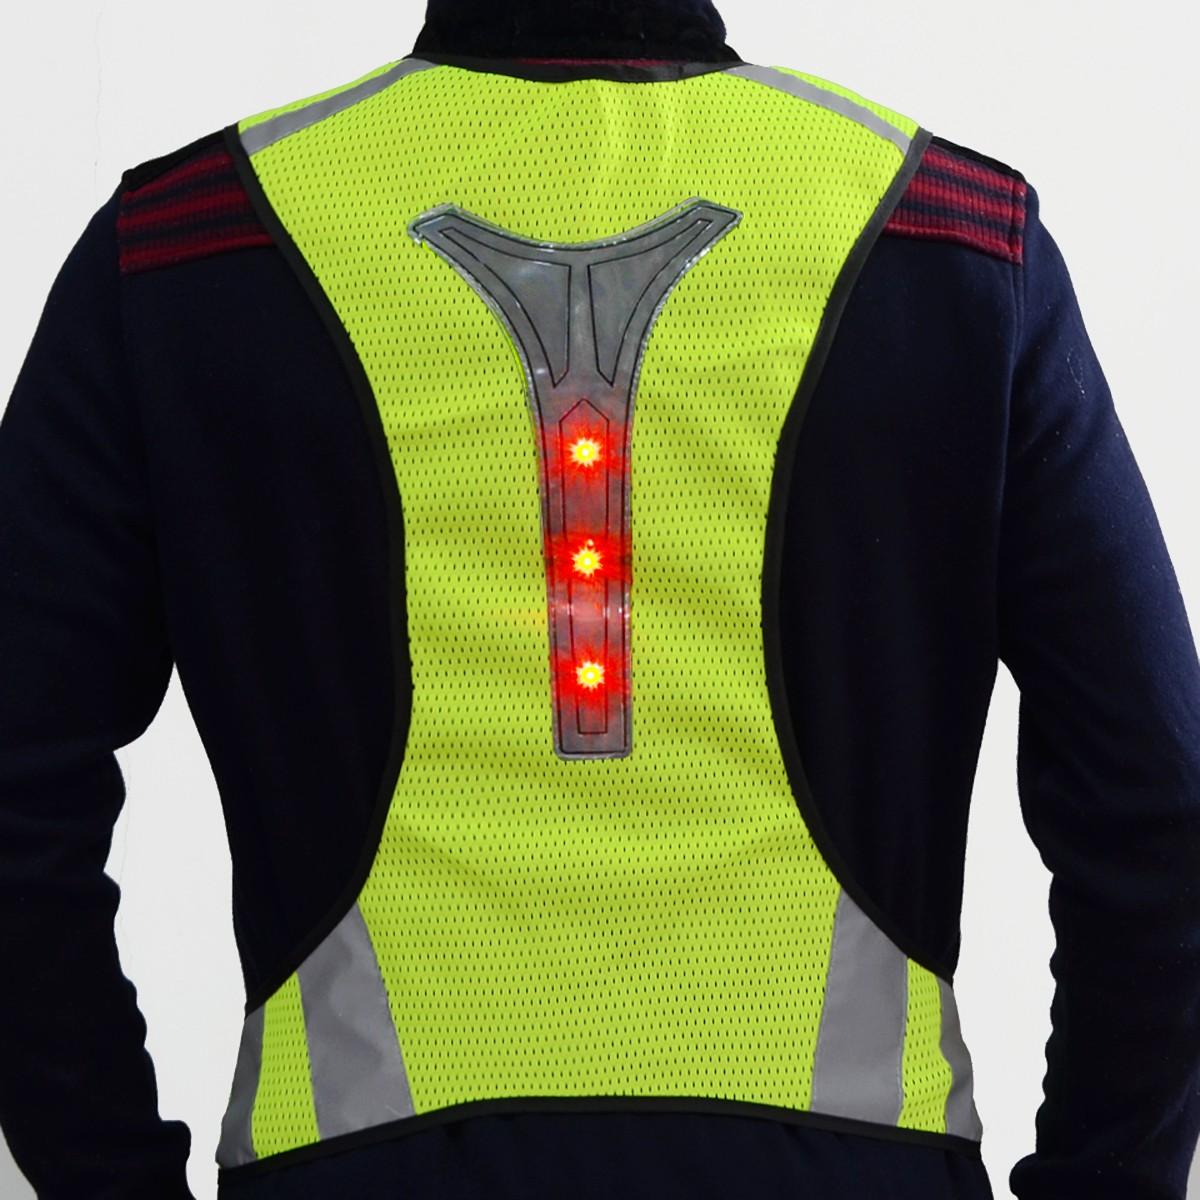 sports running jogging reflective led vest waistcoat exercise safety warning suit high. Black Bedroom Furniture Sets. Home Design Ideas